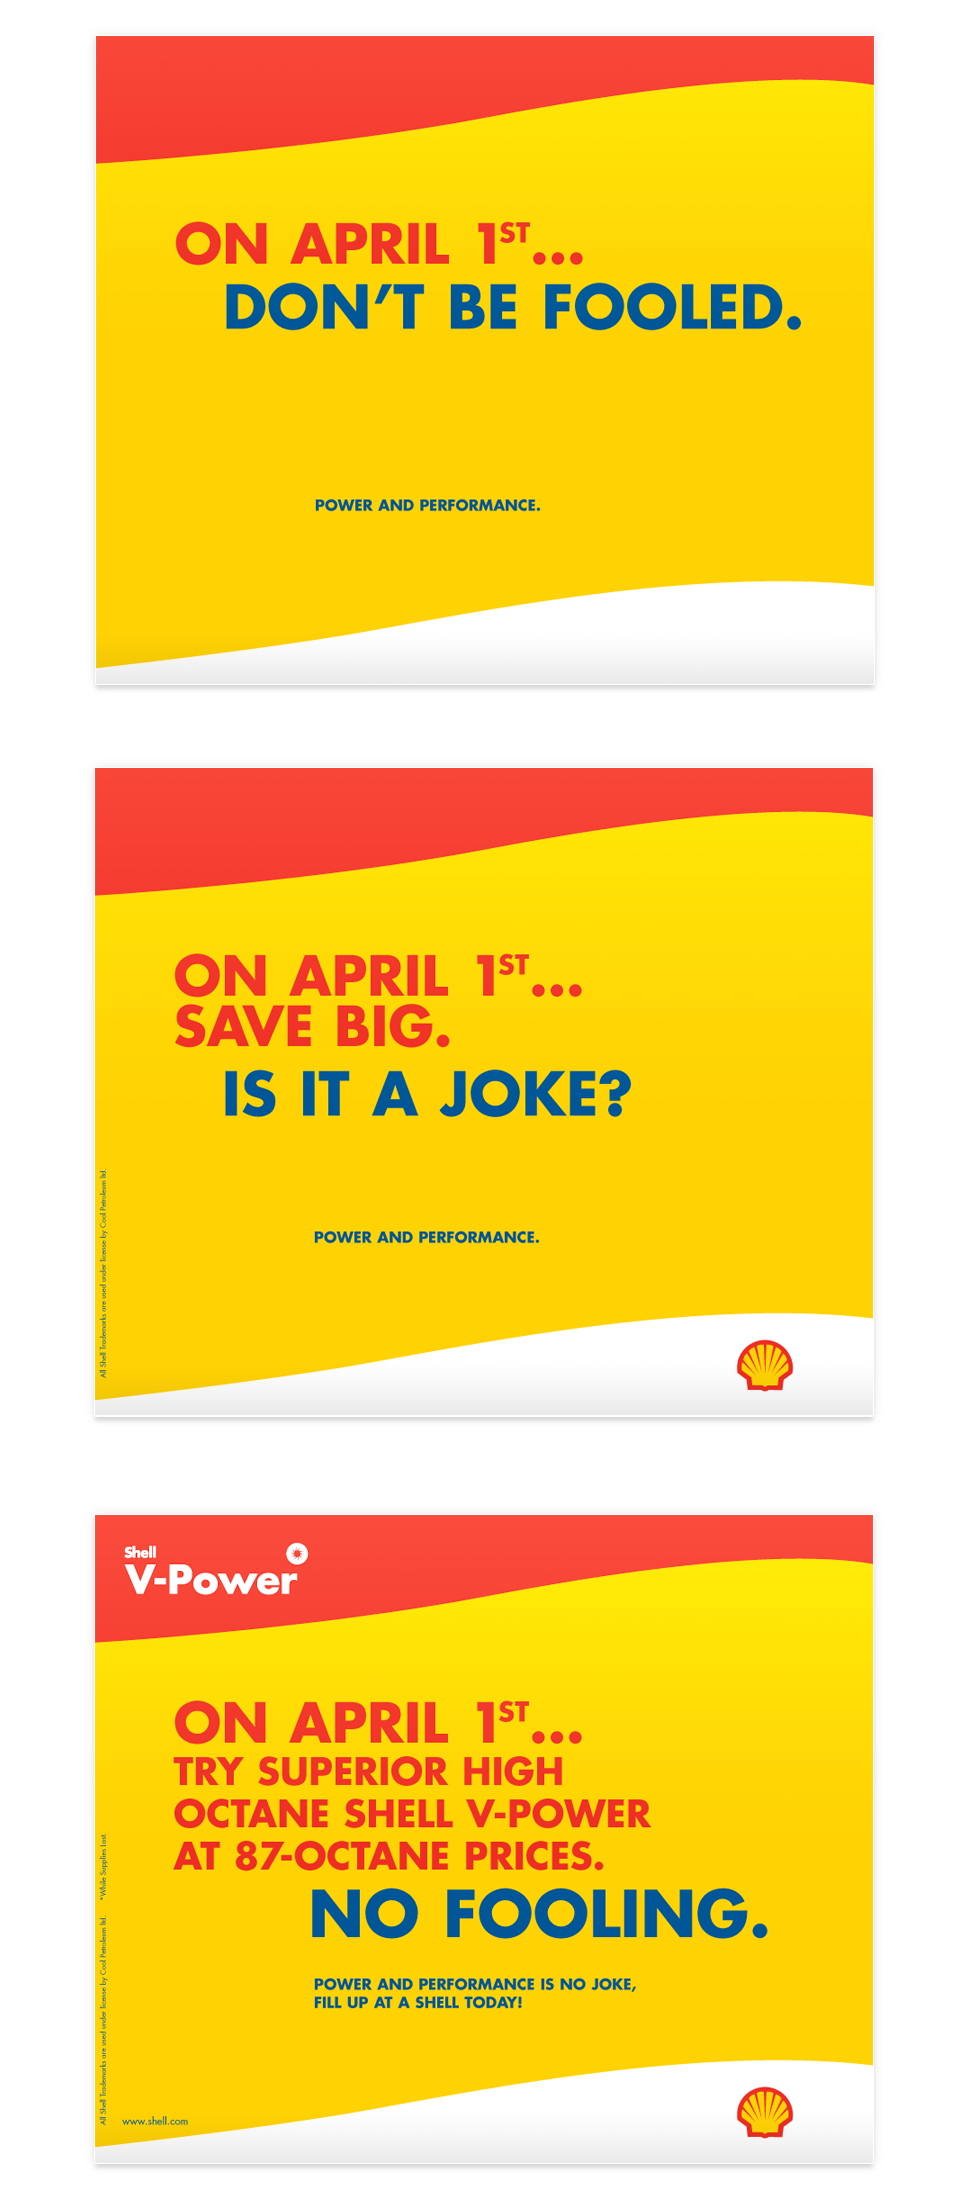 Shell Jamaica - V-Power April Fools Campaign